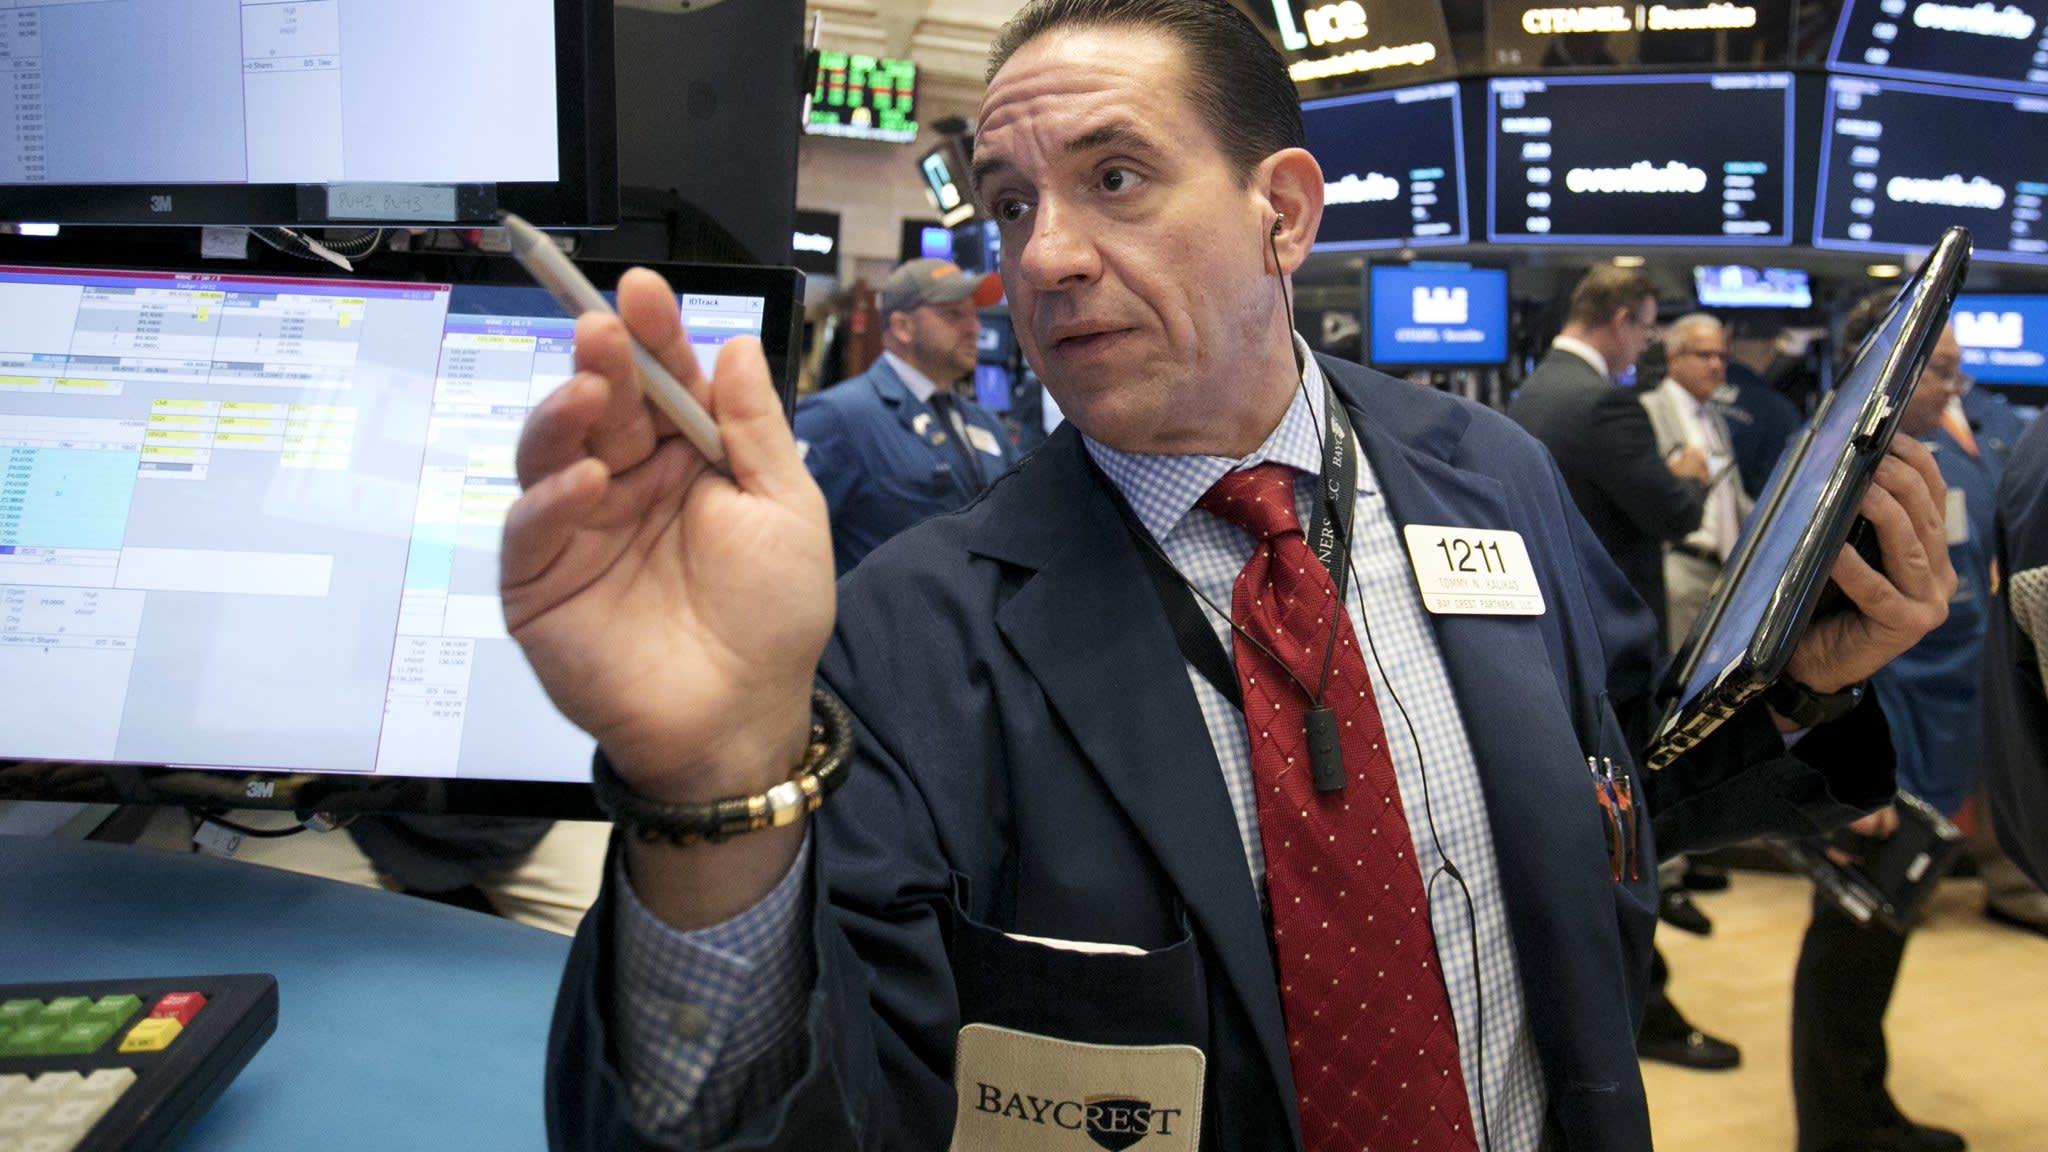 Tech sell-off leads Wall Street sharply lower